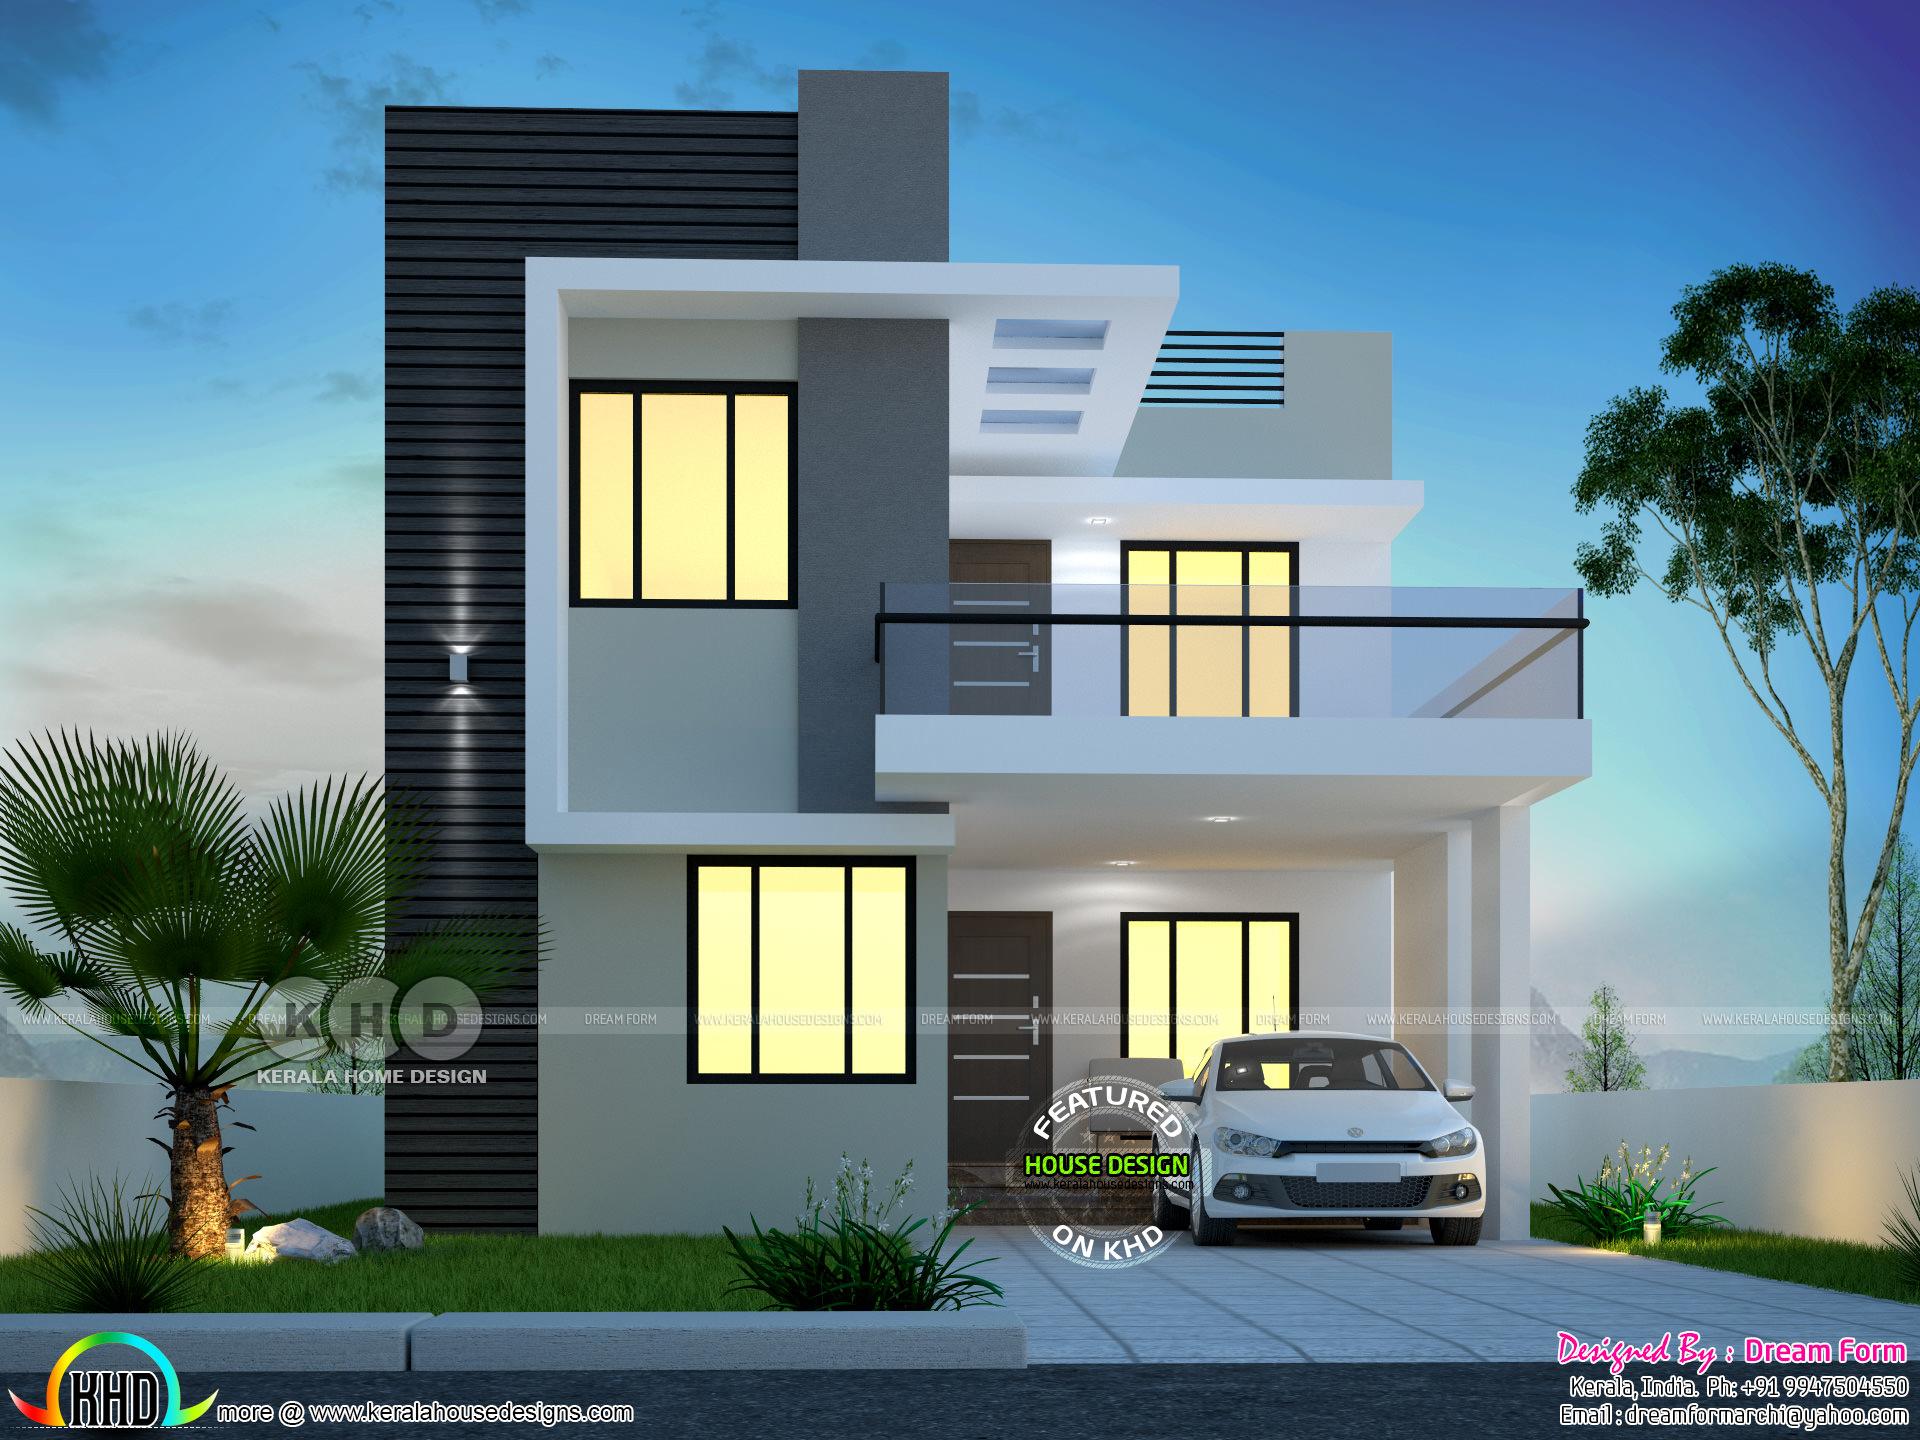 3 Bedroom 1650 Sq Ft Modern Home Design Kerala Home Design